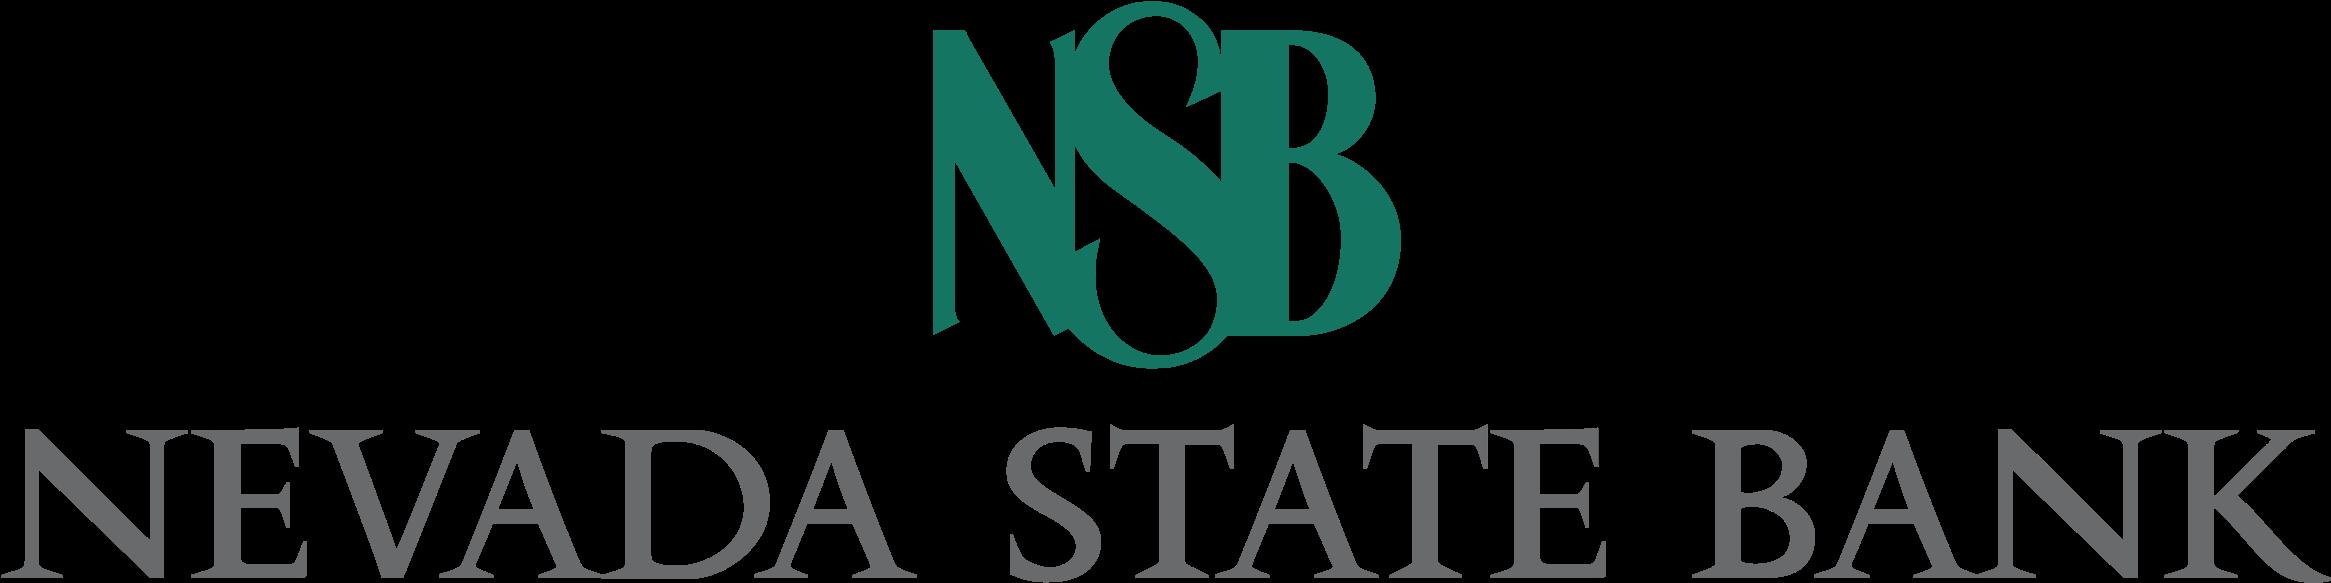 Nevada State Bank Logo Png Transparent Nevada State Bank Full Size Png Download Seekpng Including transparent png clip art, cartoon, icon, logo. seekpng